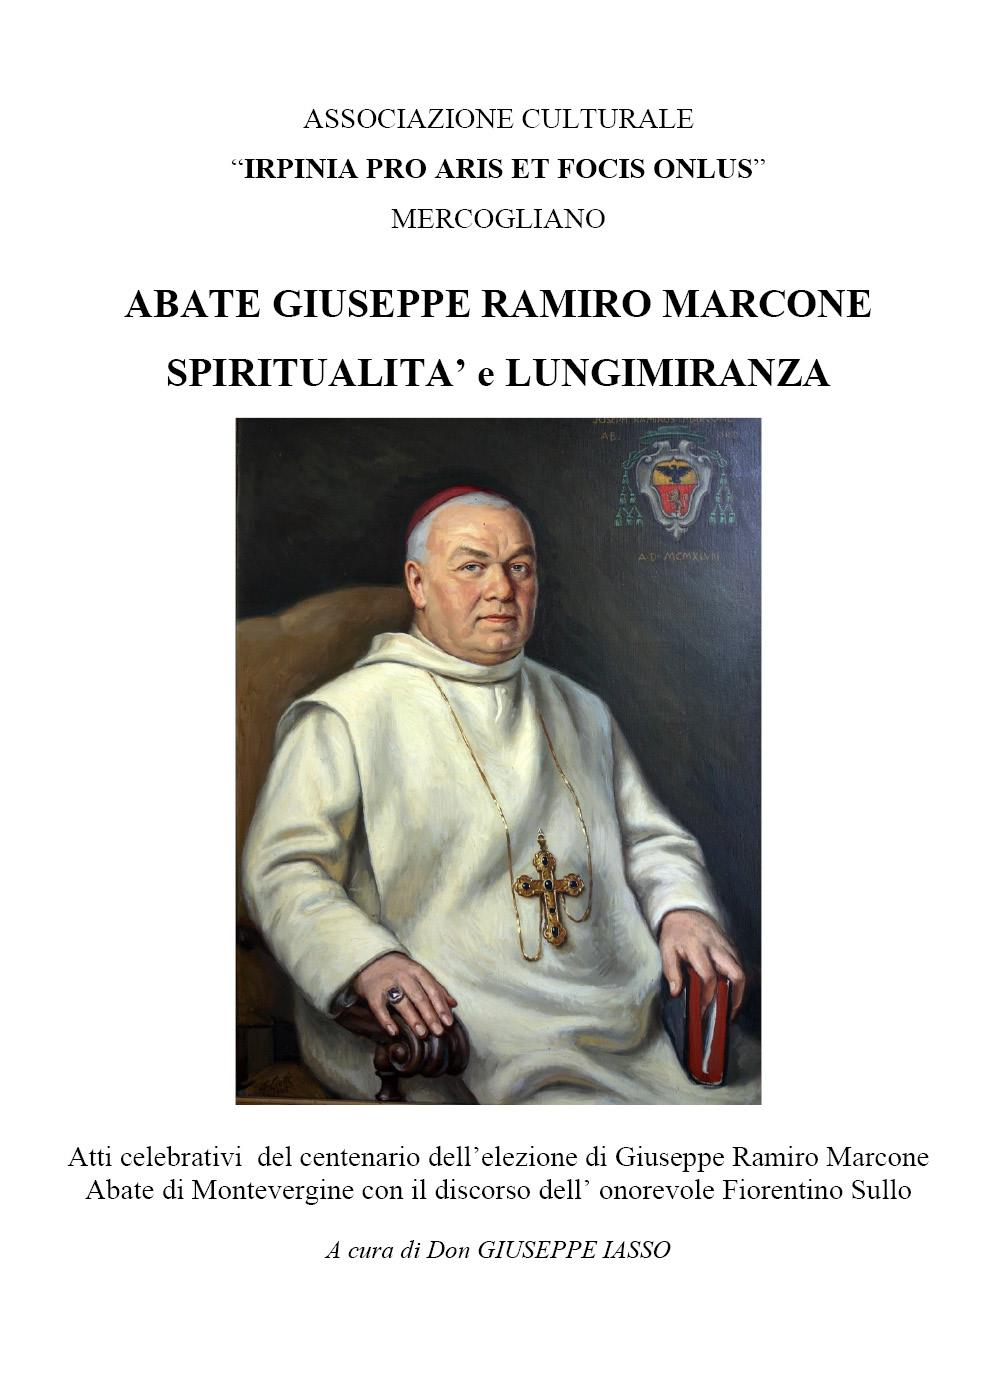 Abate GIUSEPPE RAMIRO MARCONE spiritualità e lungimiranza